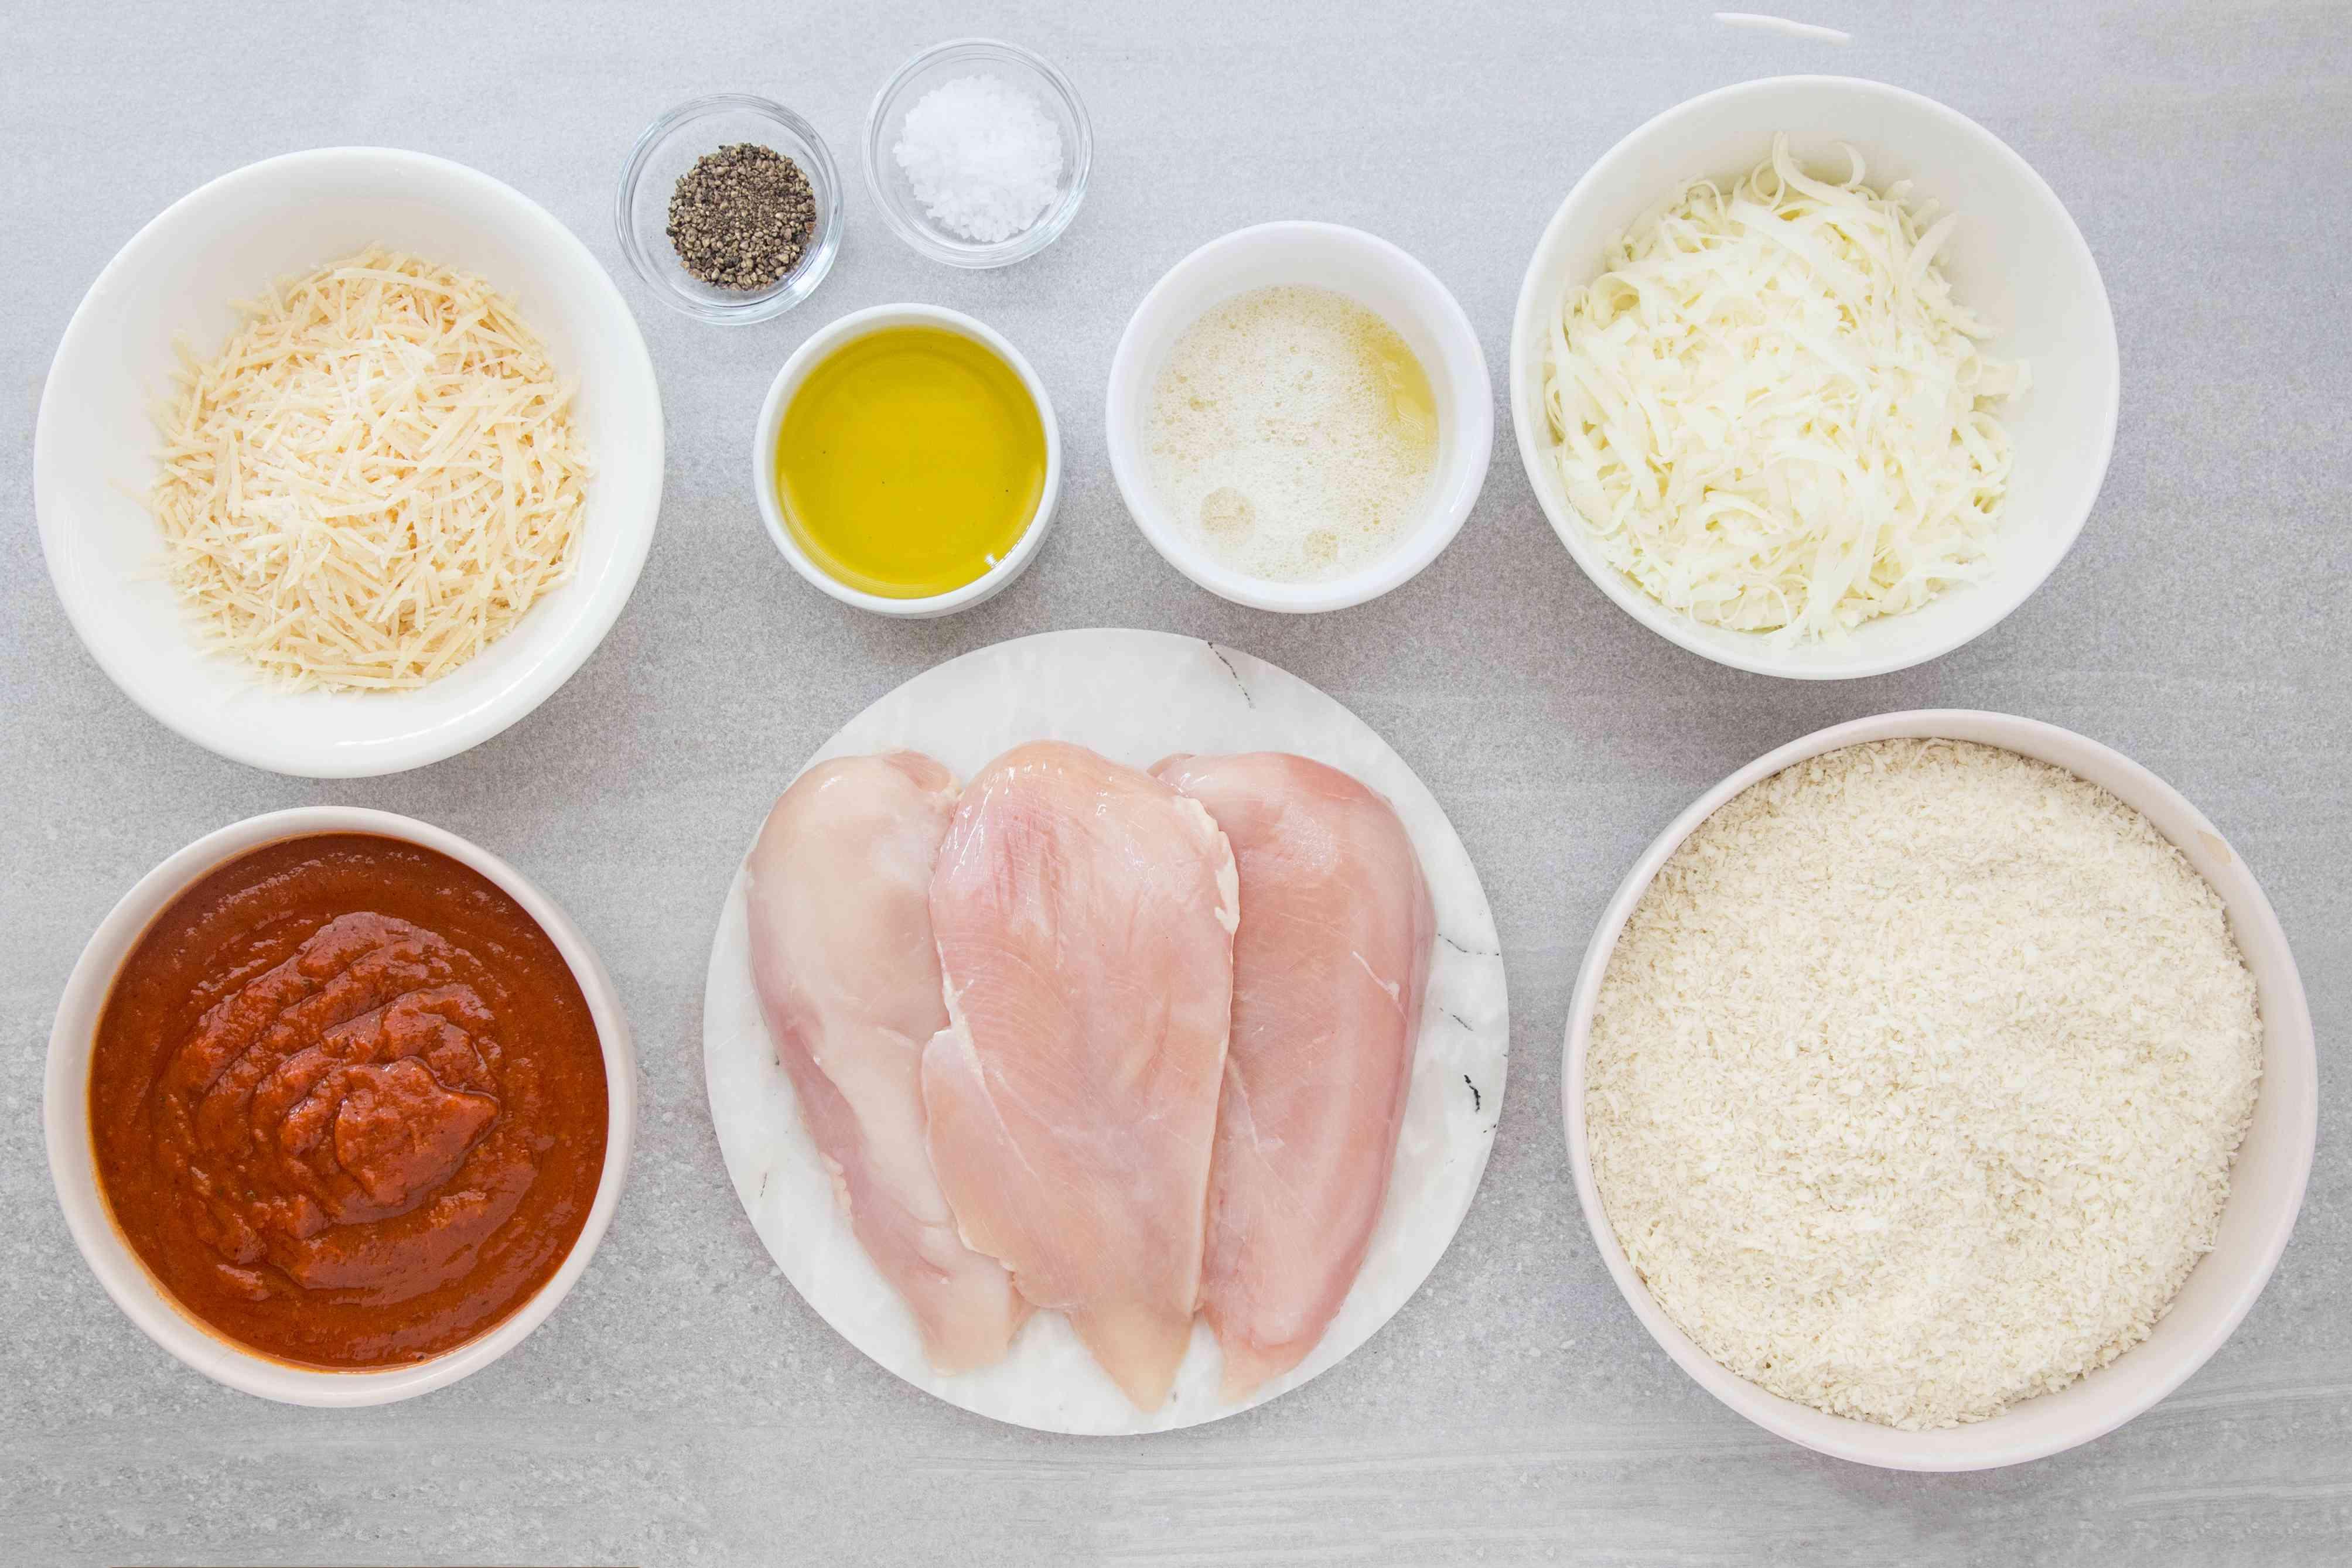 Easy Chicken Parmesan ingredients